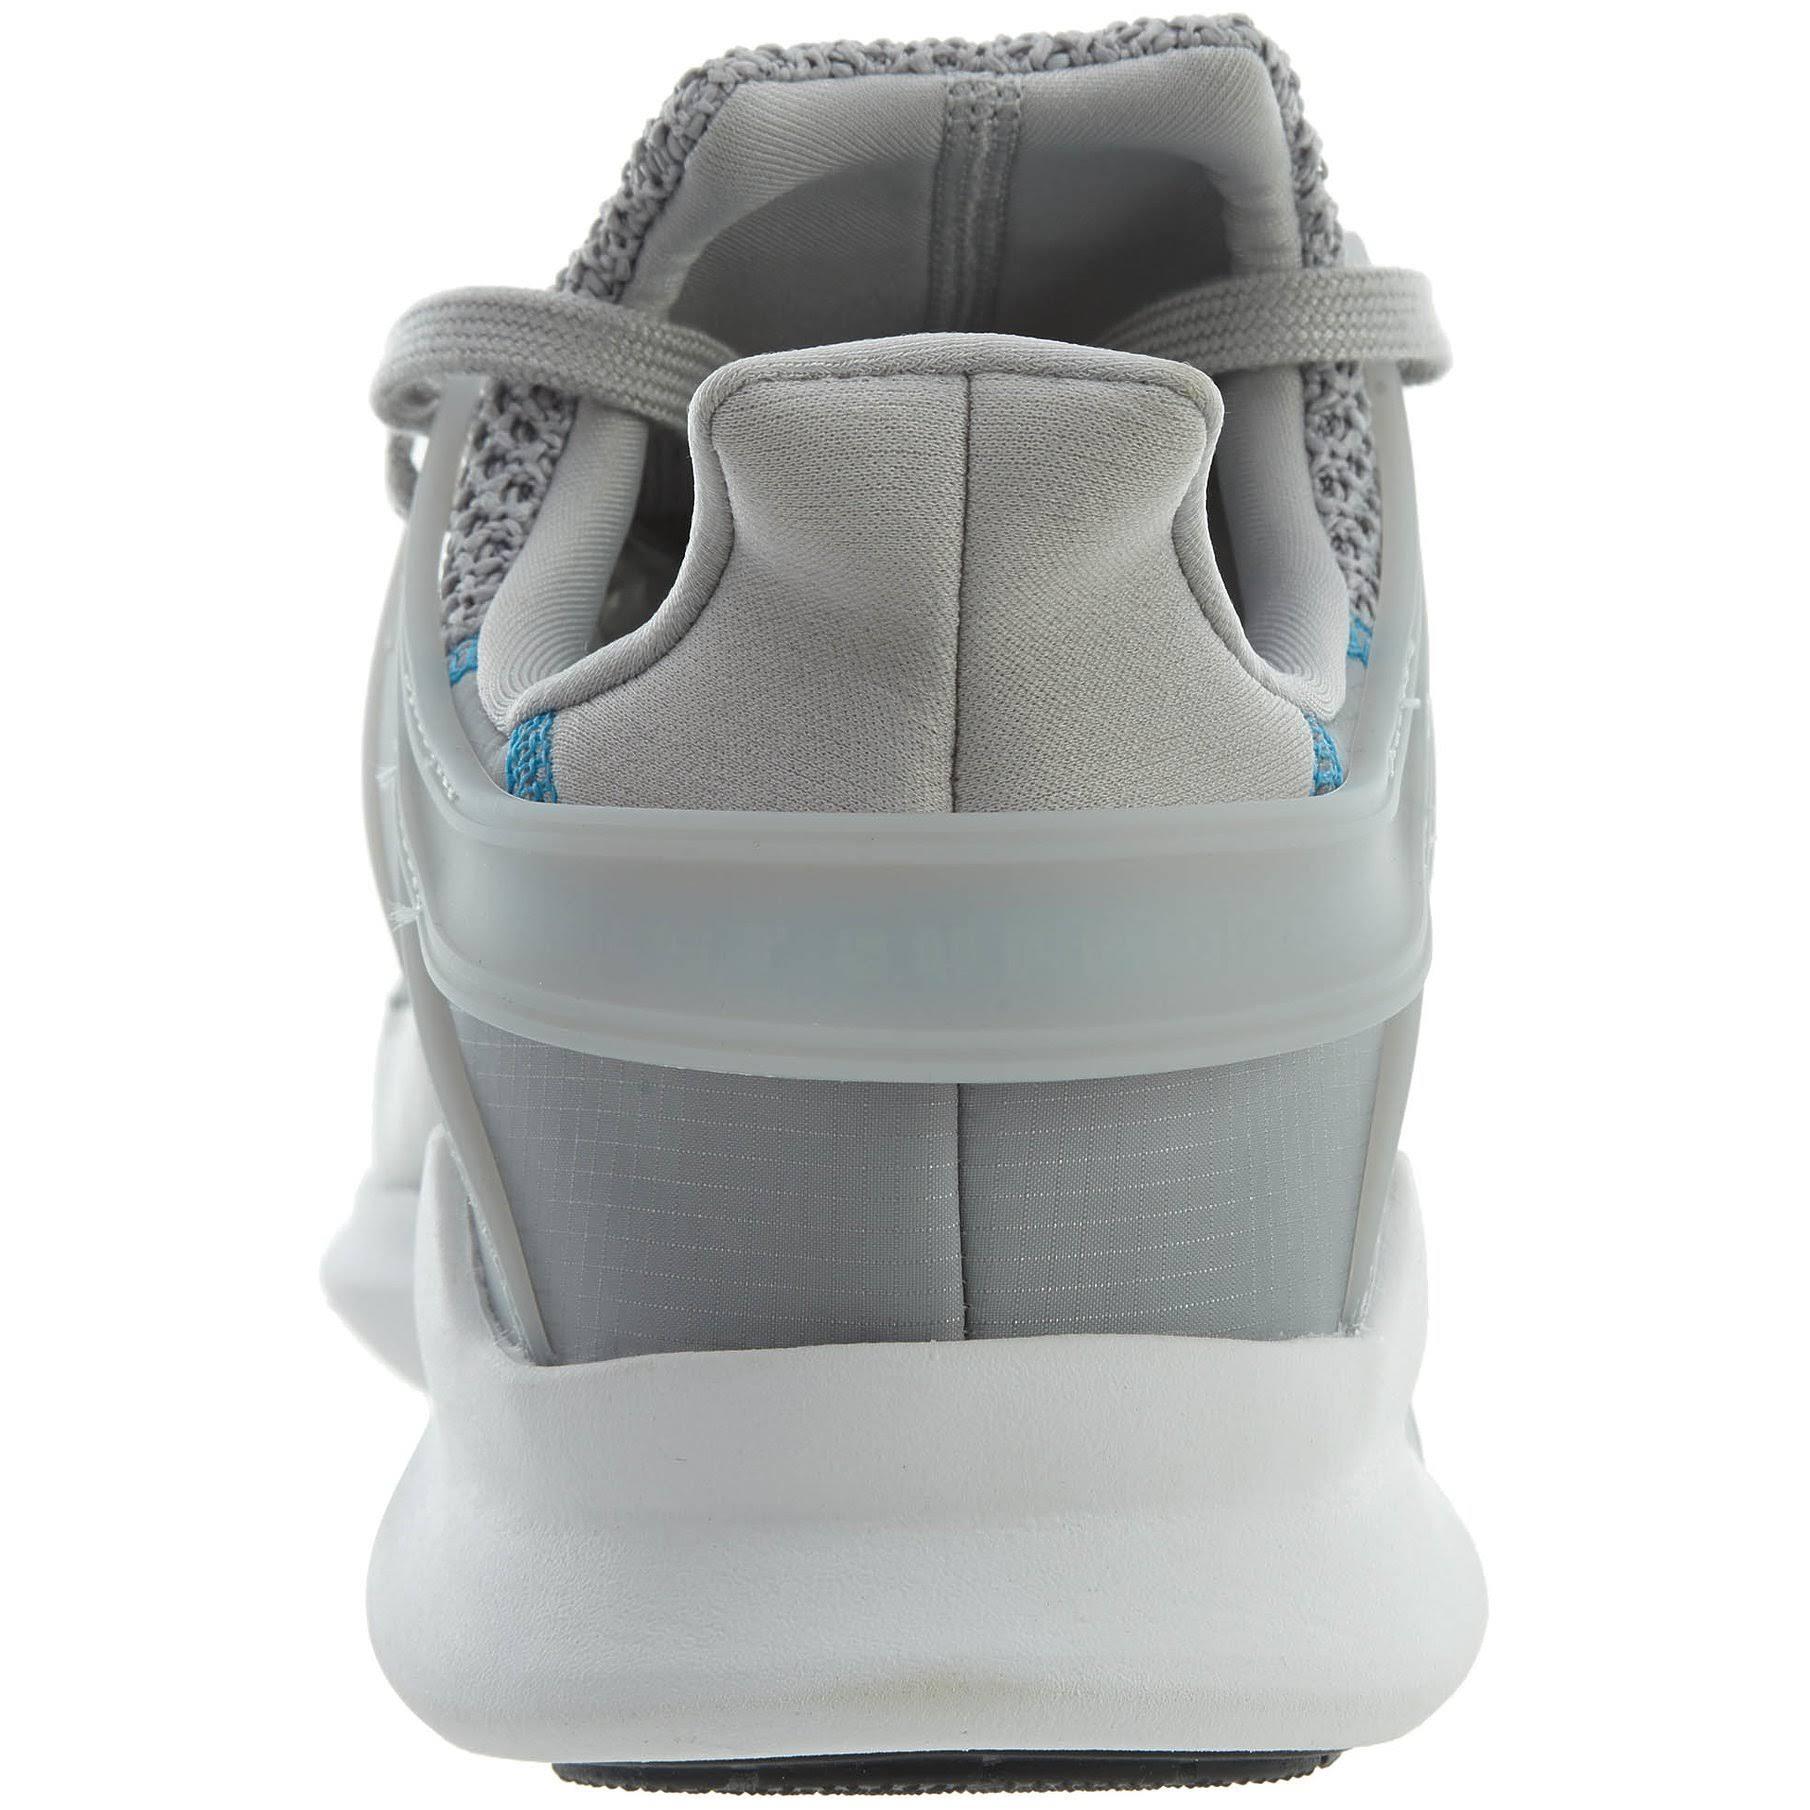 Adv Adidas 11 Support Grigiogrigio Eqt Grigio bianco tCsdBrxhoQ